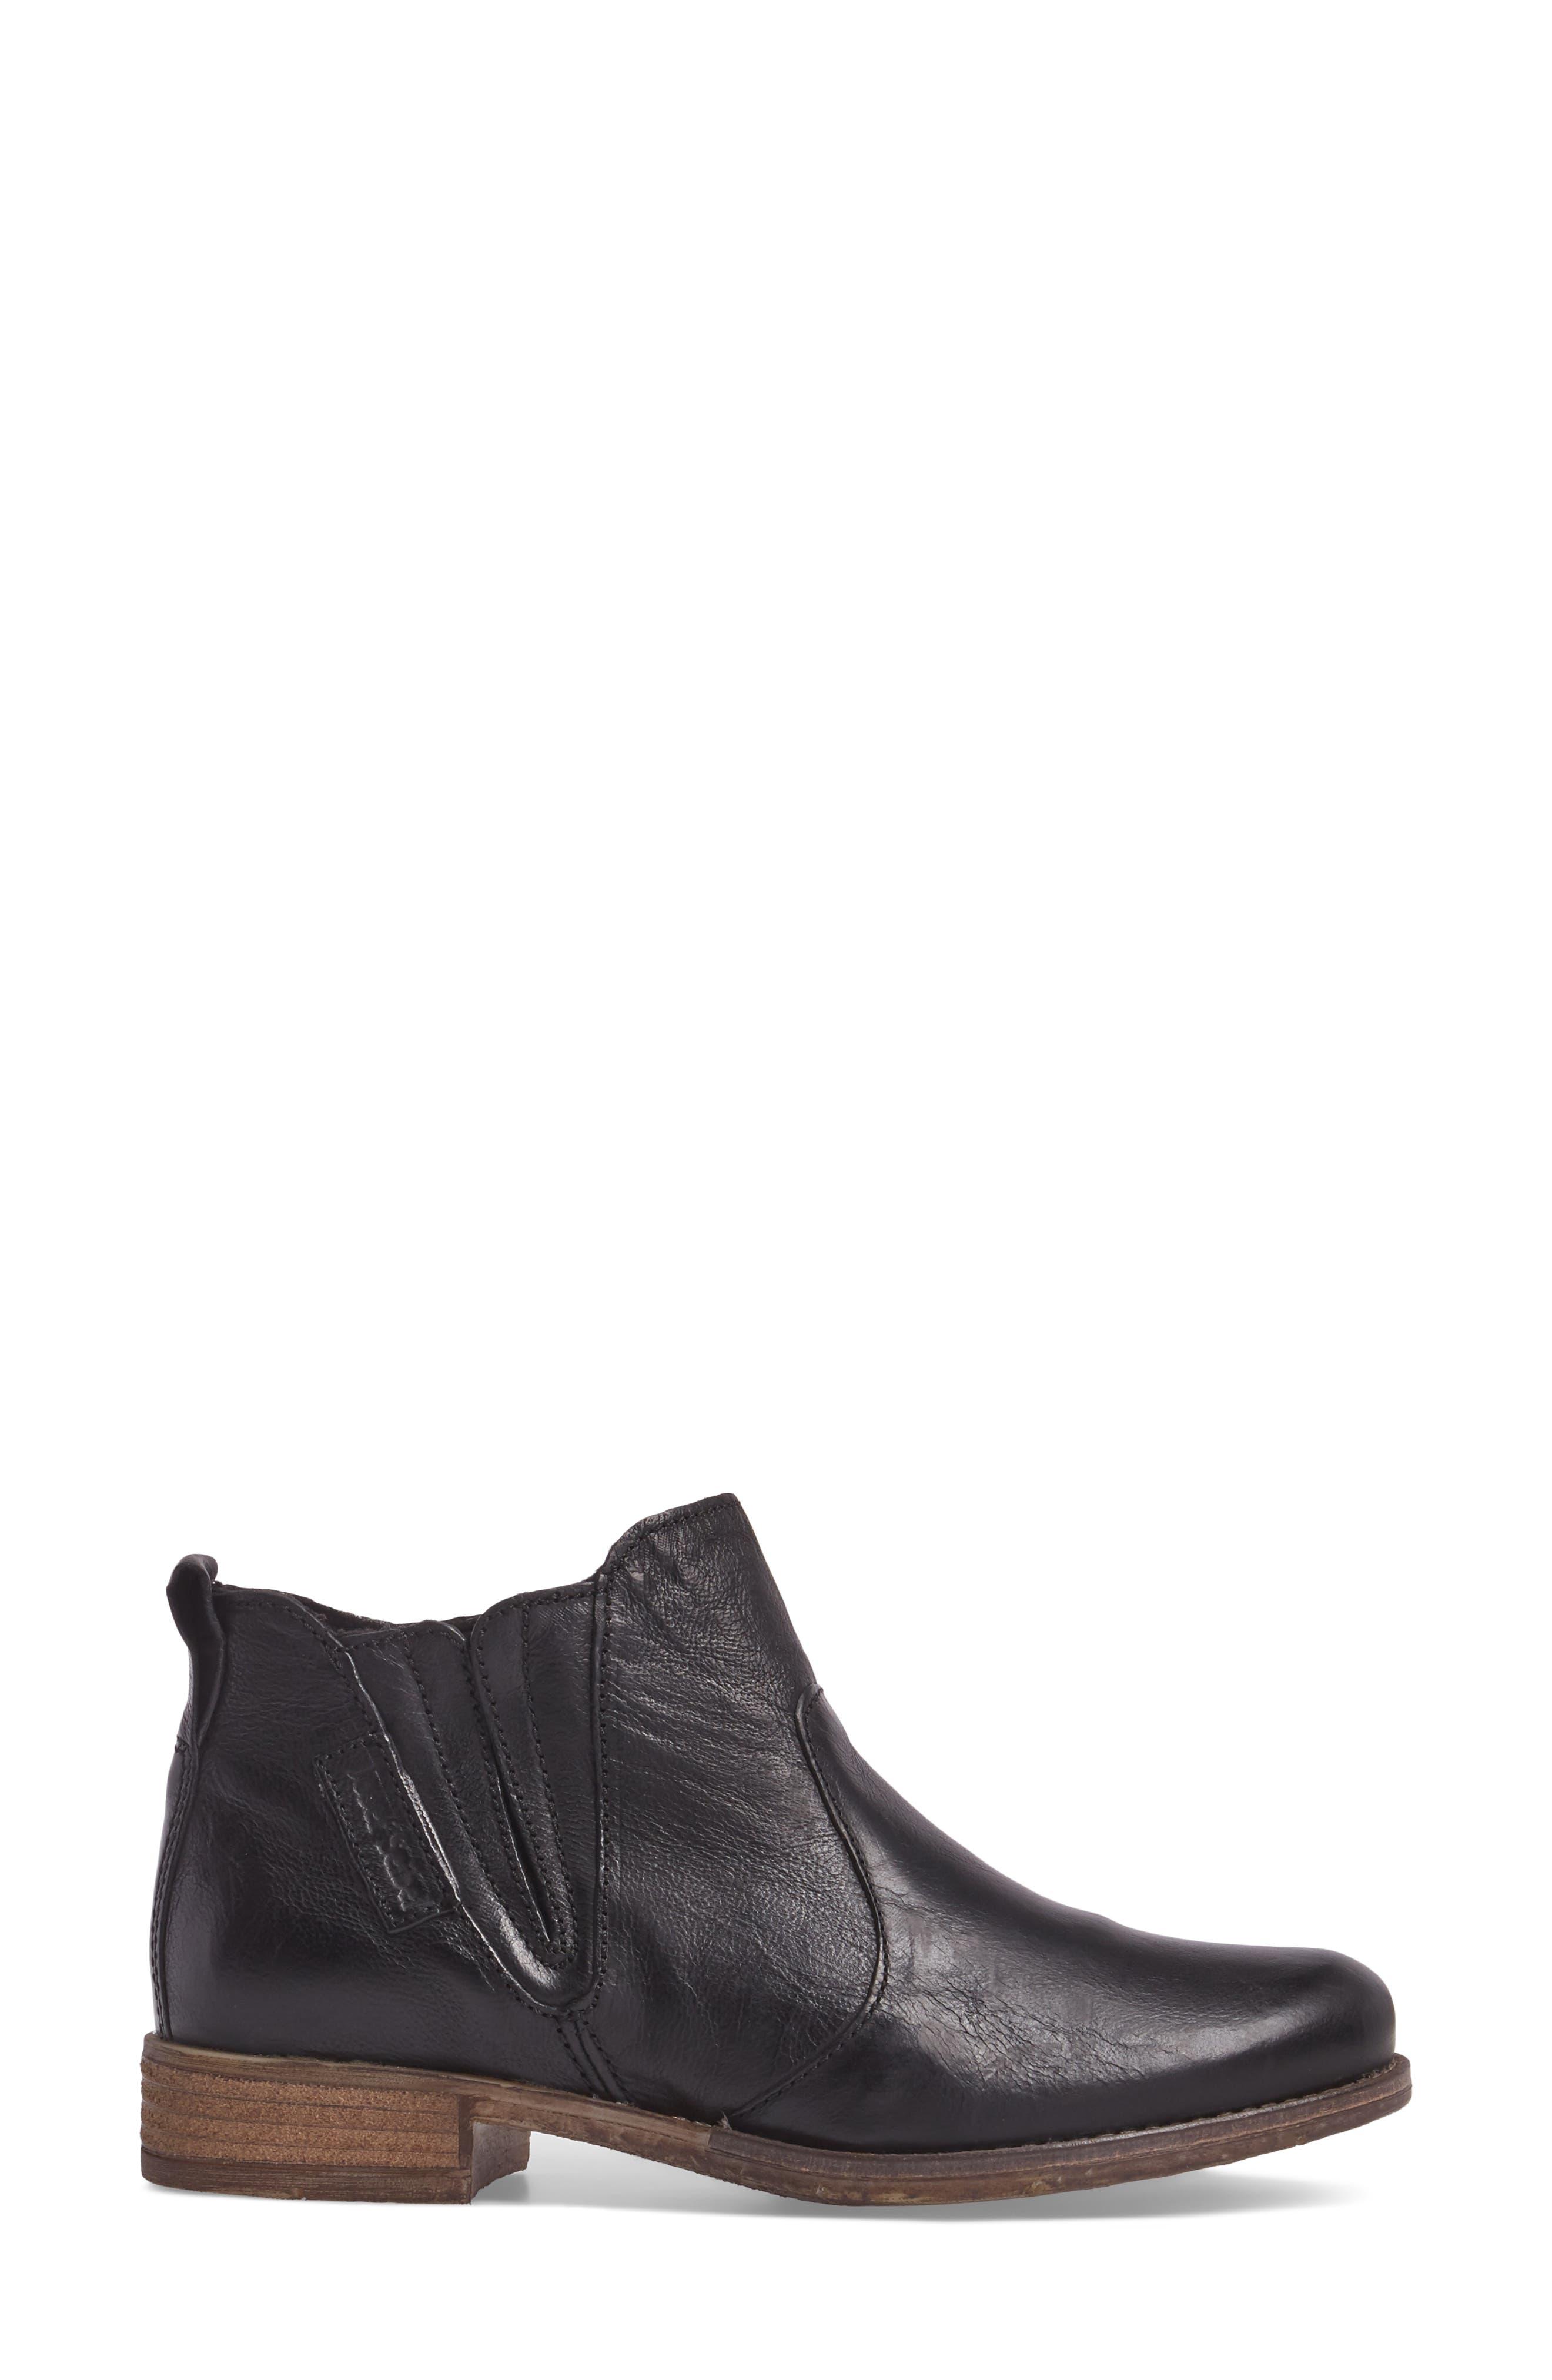 Sienna 45 Chelsea Bootie,                             Alternate thumbnail 3, color,                             Black Leather